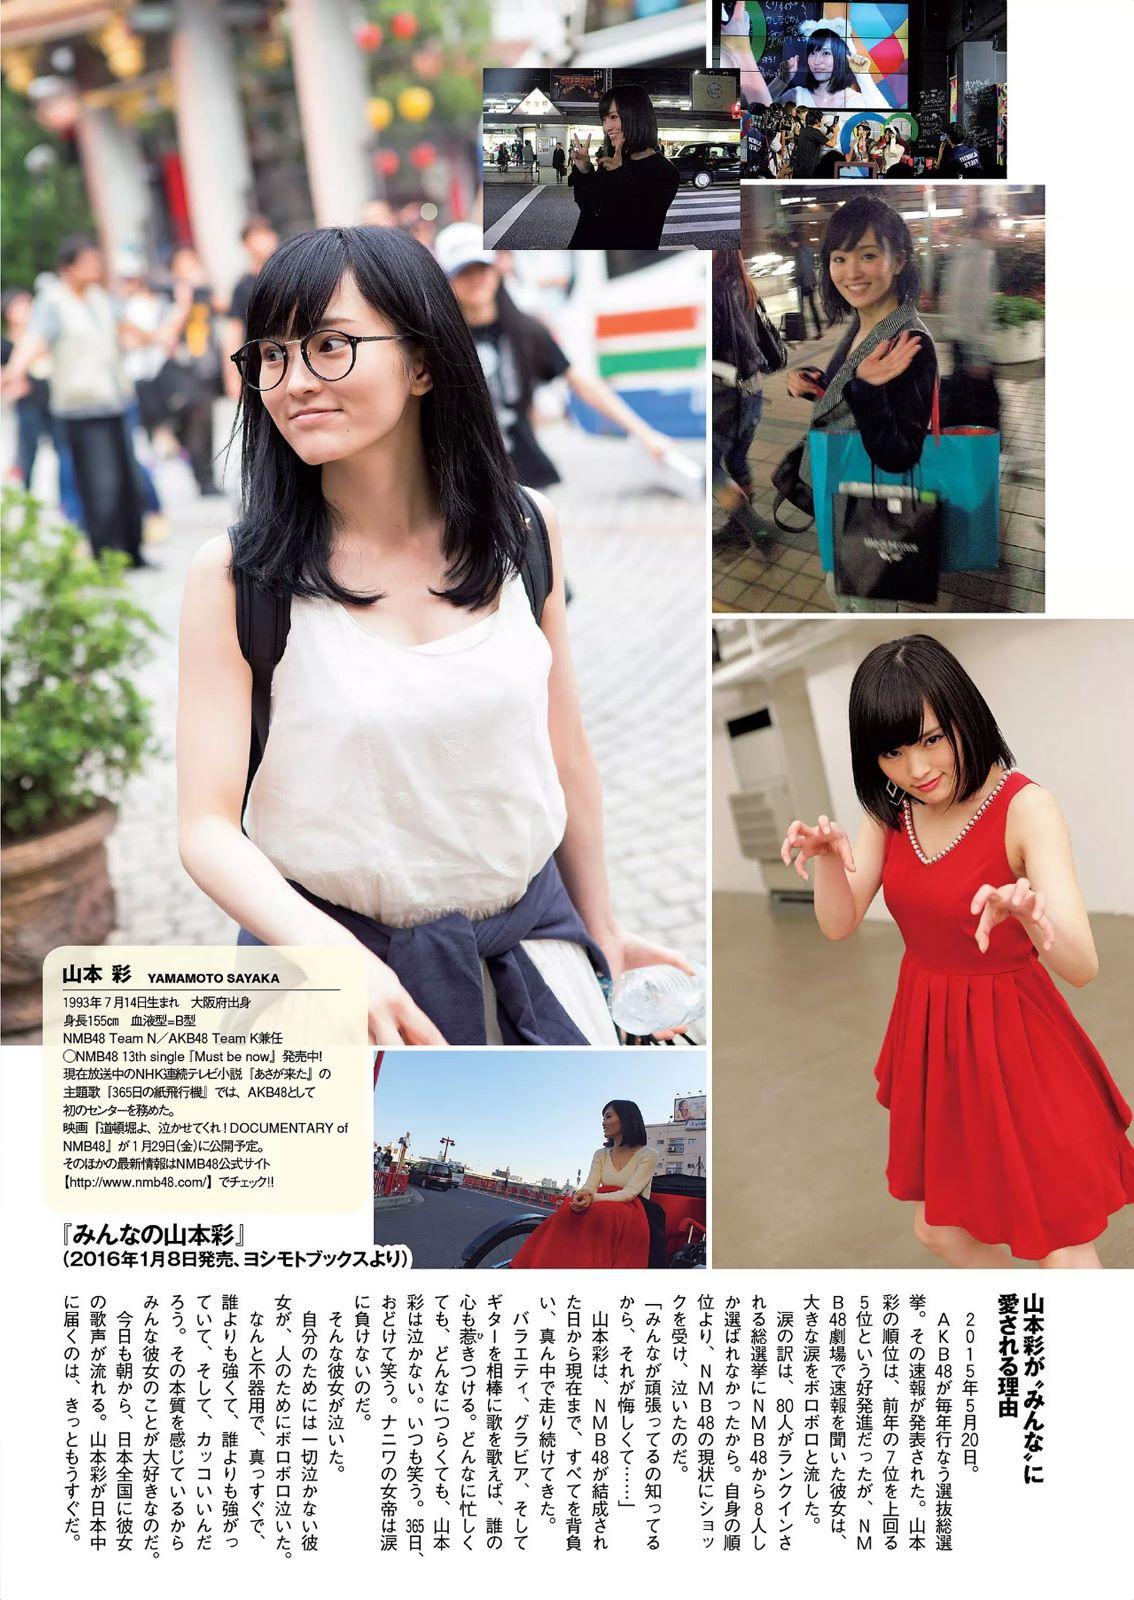 ... Yamamoto Sayaka Weekly Playboy 2016 No 3-4 Pictures | Hot